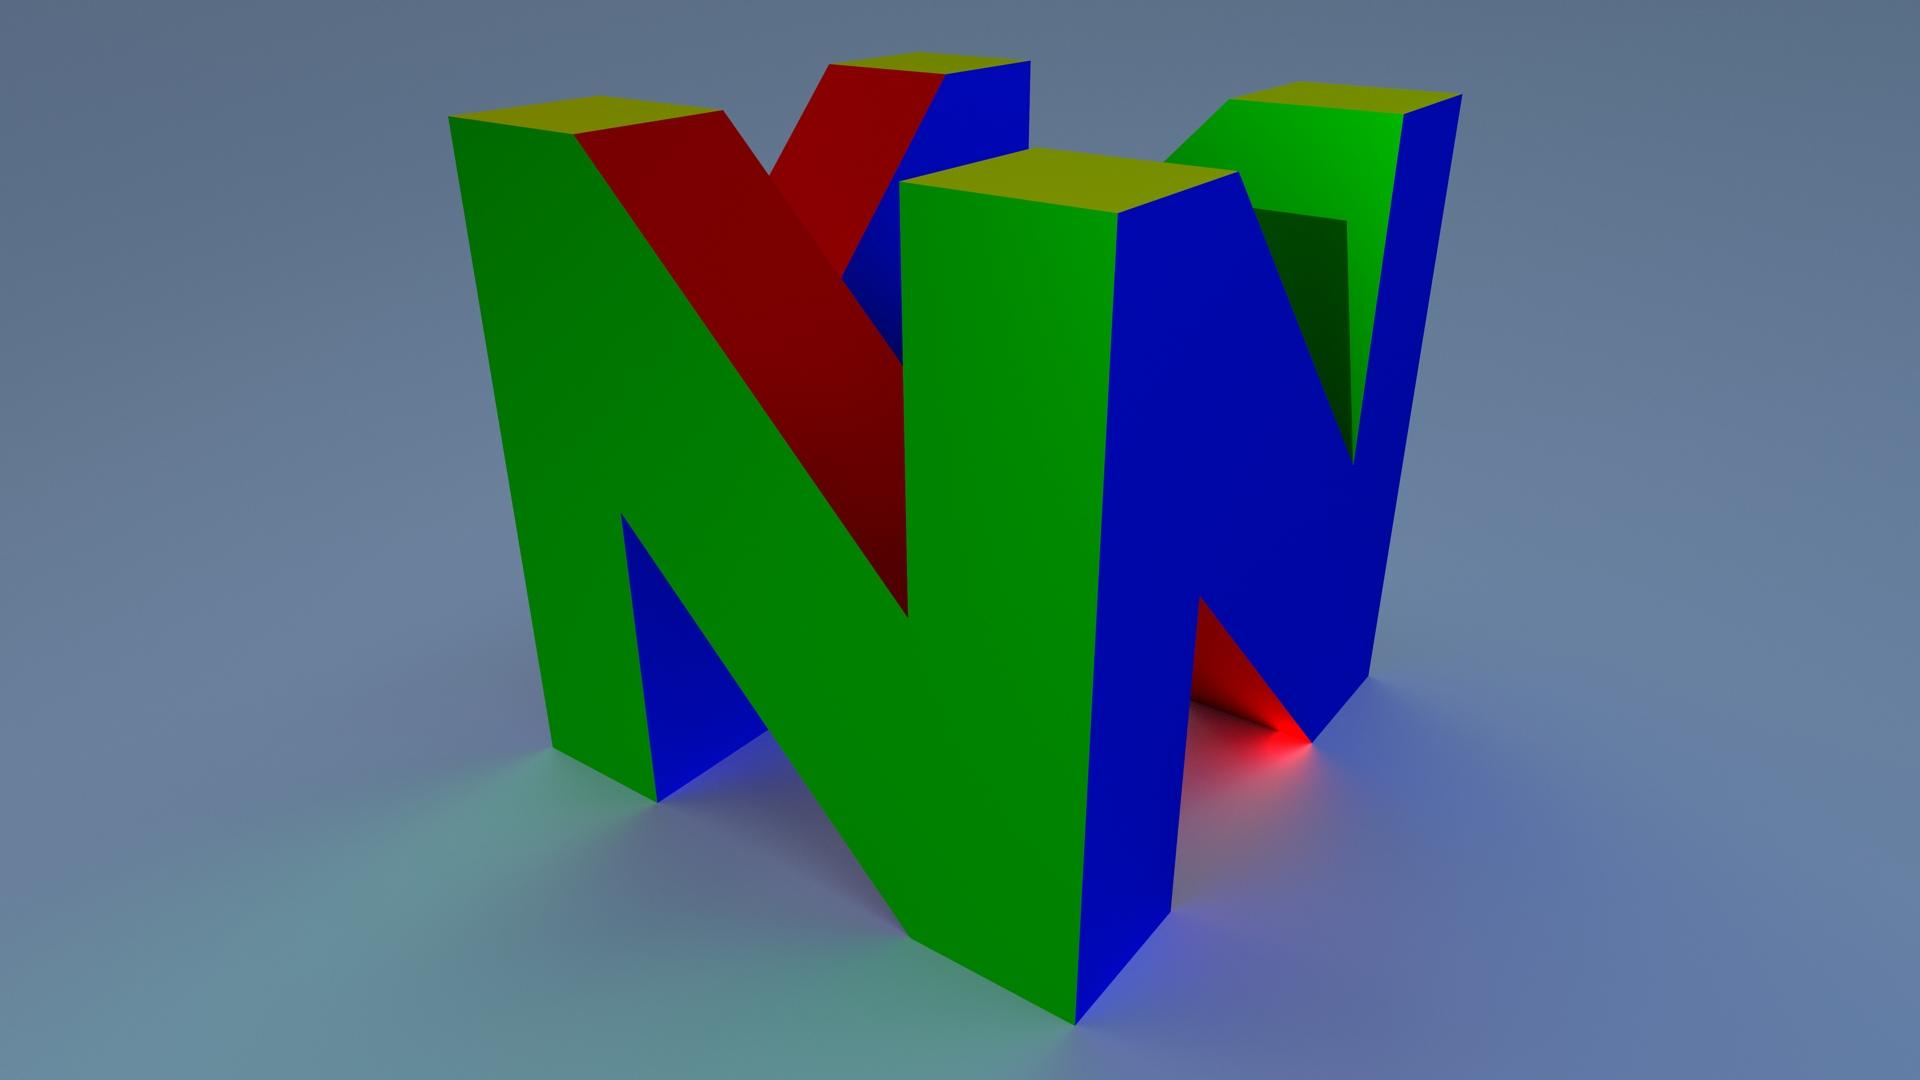 n64 logo hd wallpaper - HD1920×1080